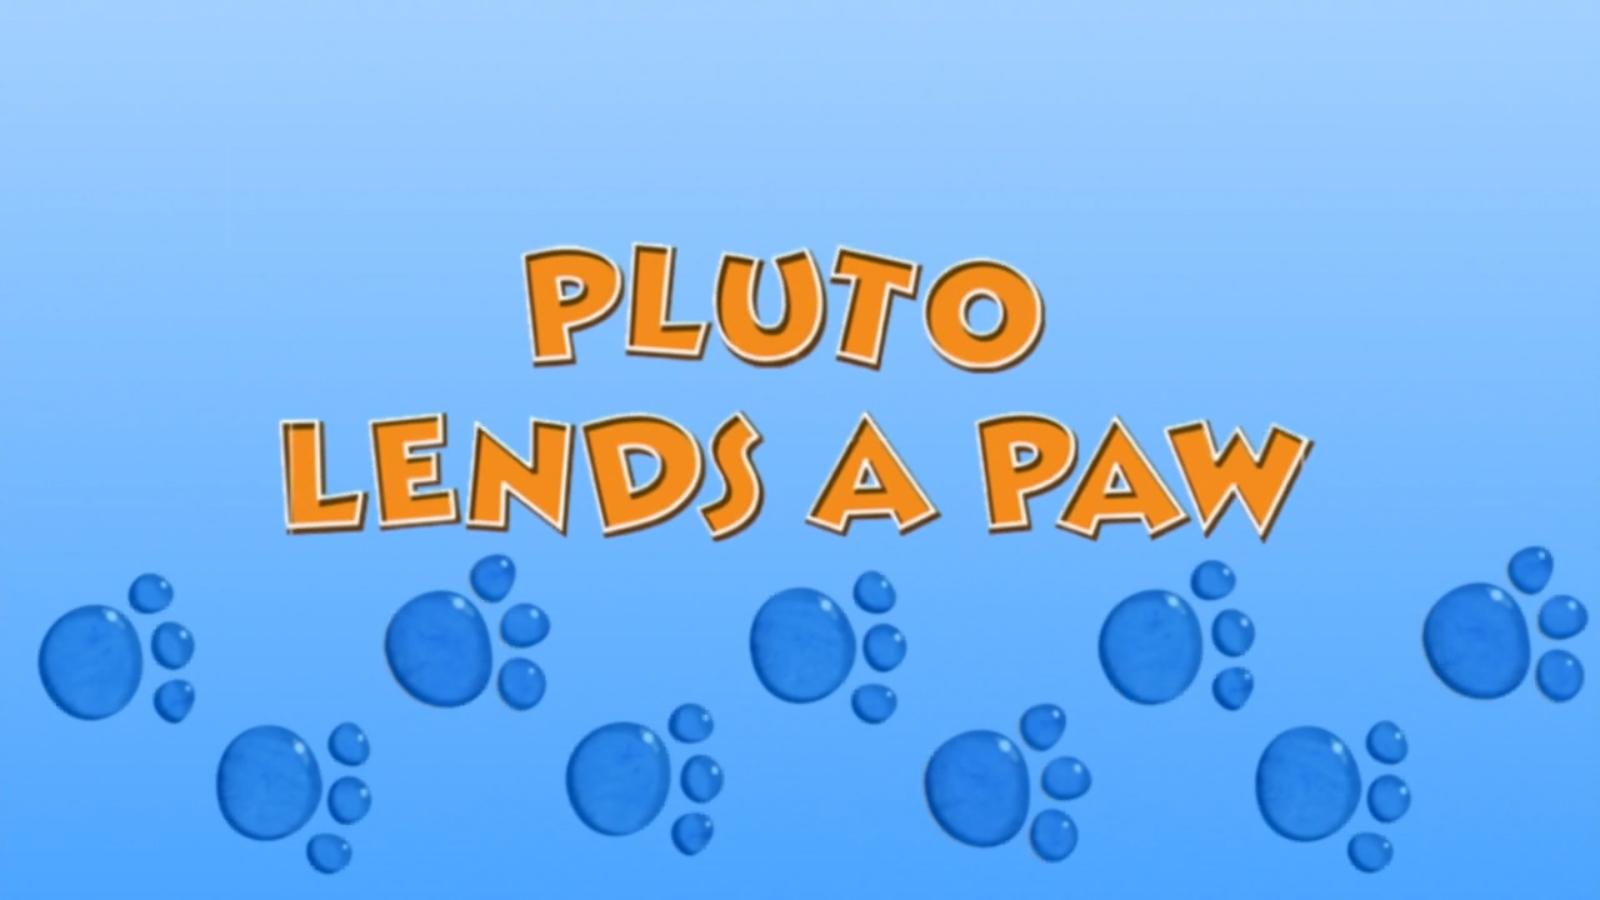 Pluto Lends a Paw